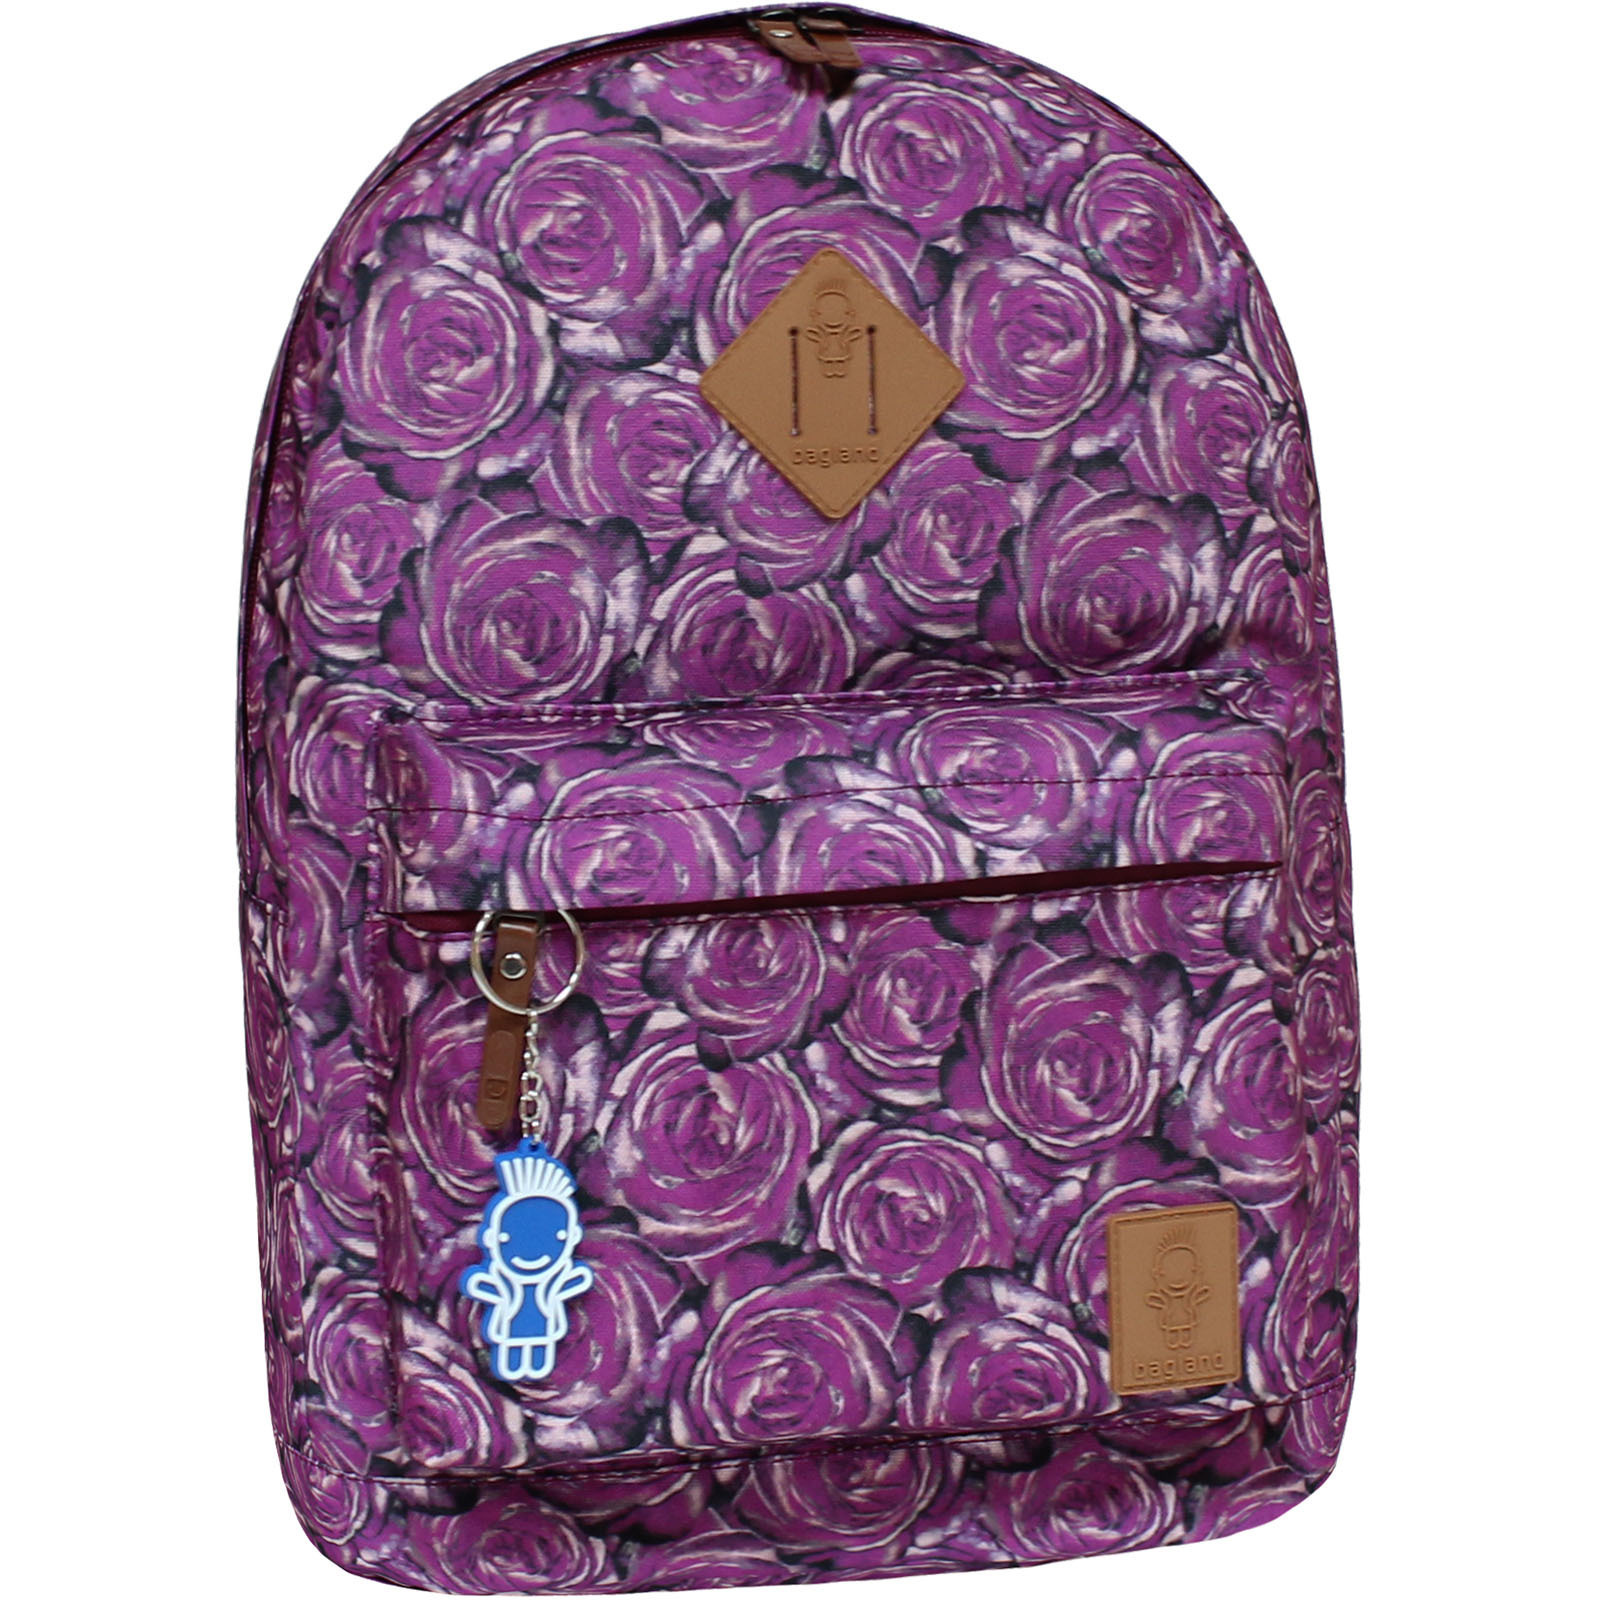 Городские рюкзаки Рюкзак Bagland Молодежный (дизайн) 17 л. сублимация 155 (00533664) IMG_7025_155.JPG